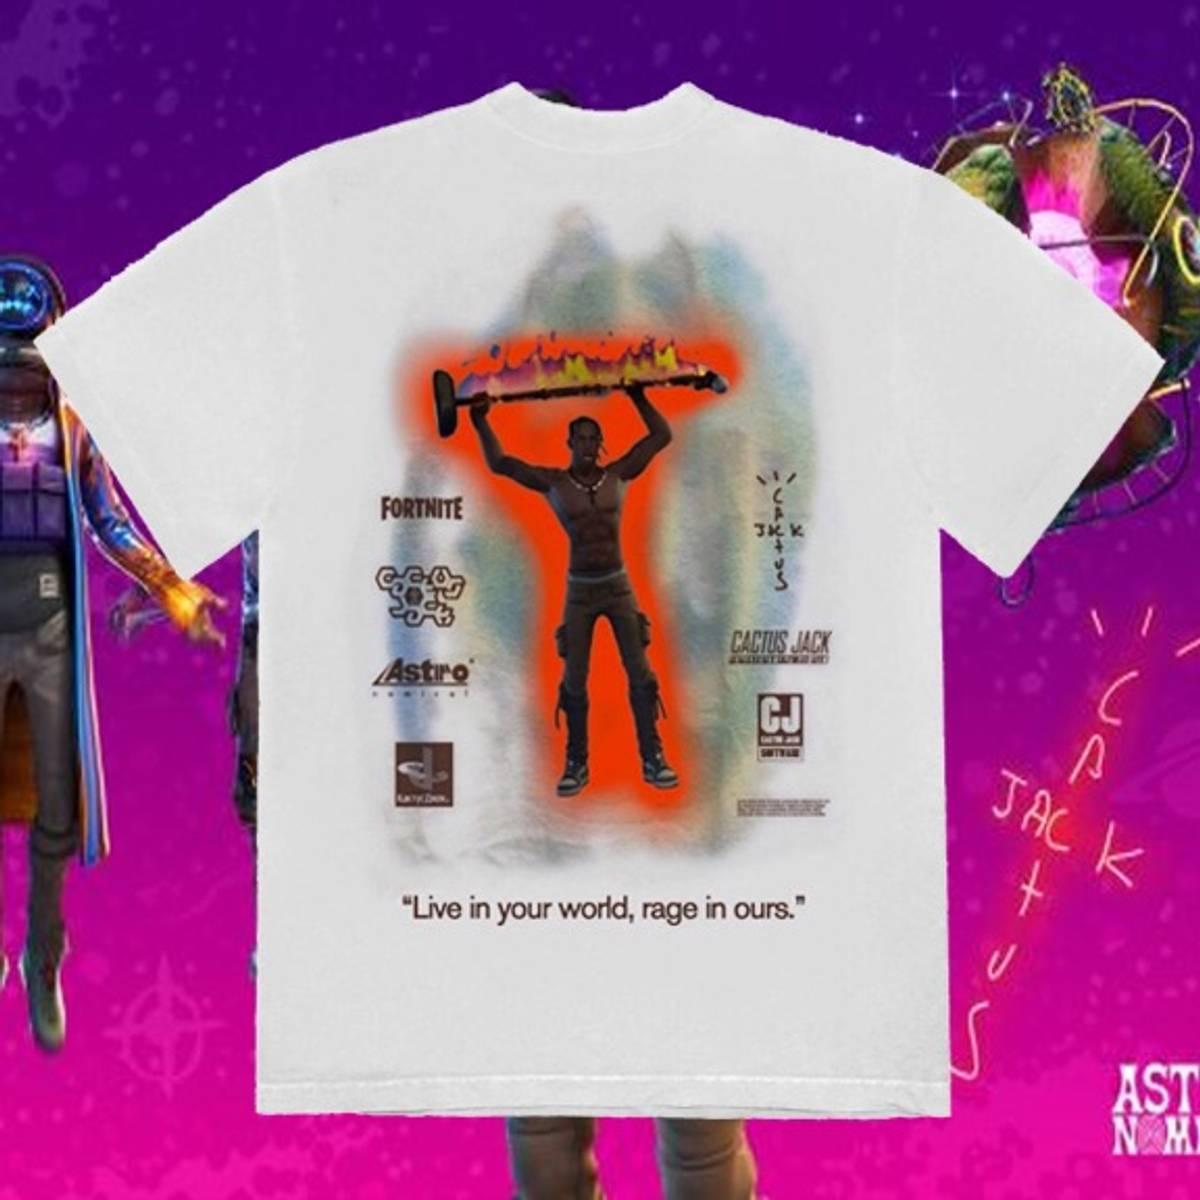 Travis Scott Travis Scott Fortnite Shirt Cactus Jack Astronomical Rap Tee Grailed